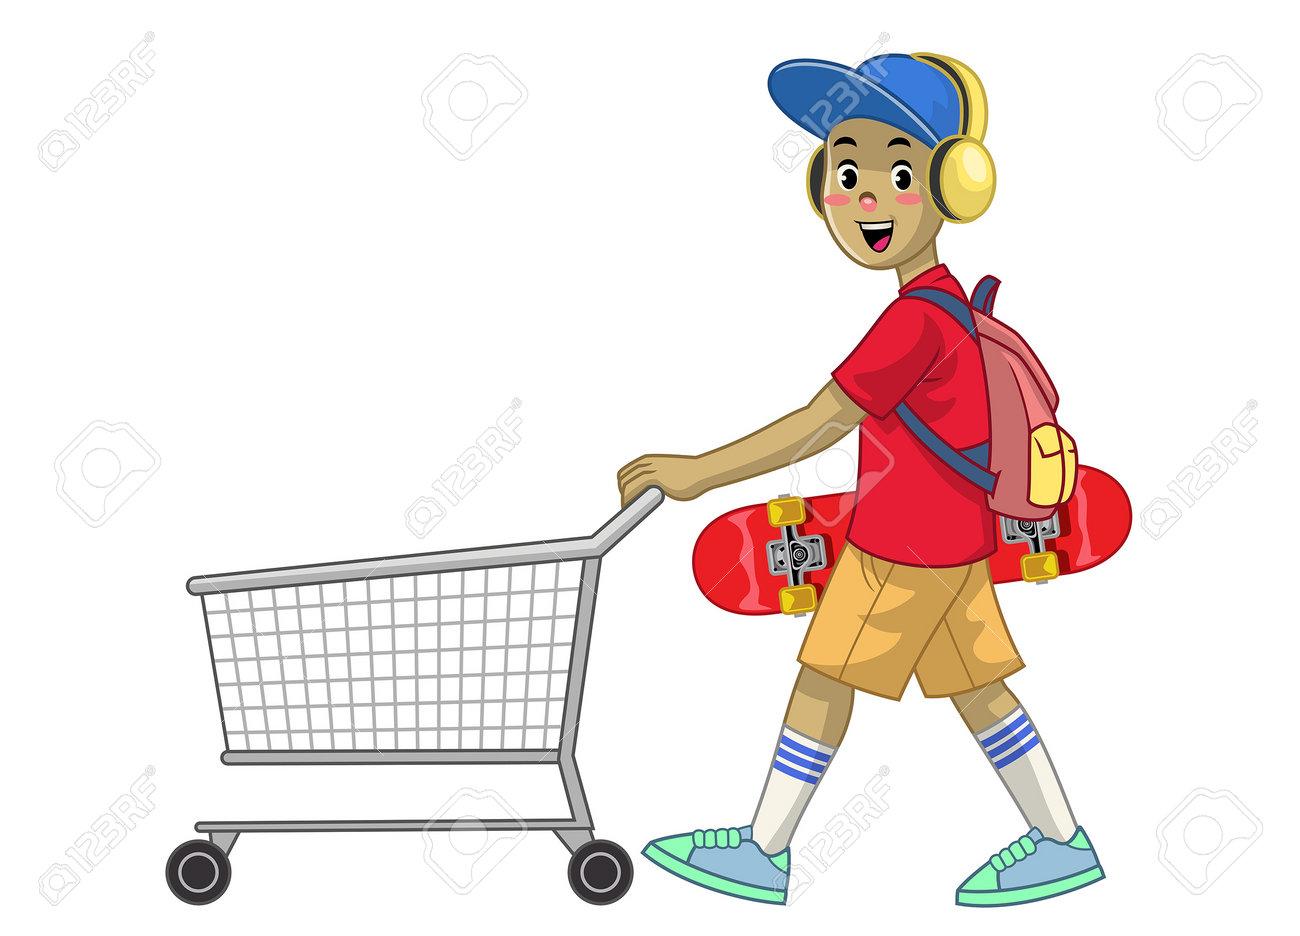 cartoon skater boy pushing the shopping cart - 161958448